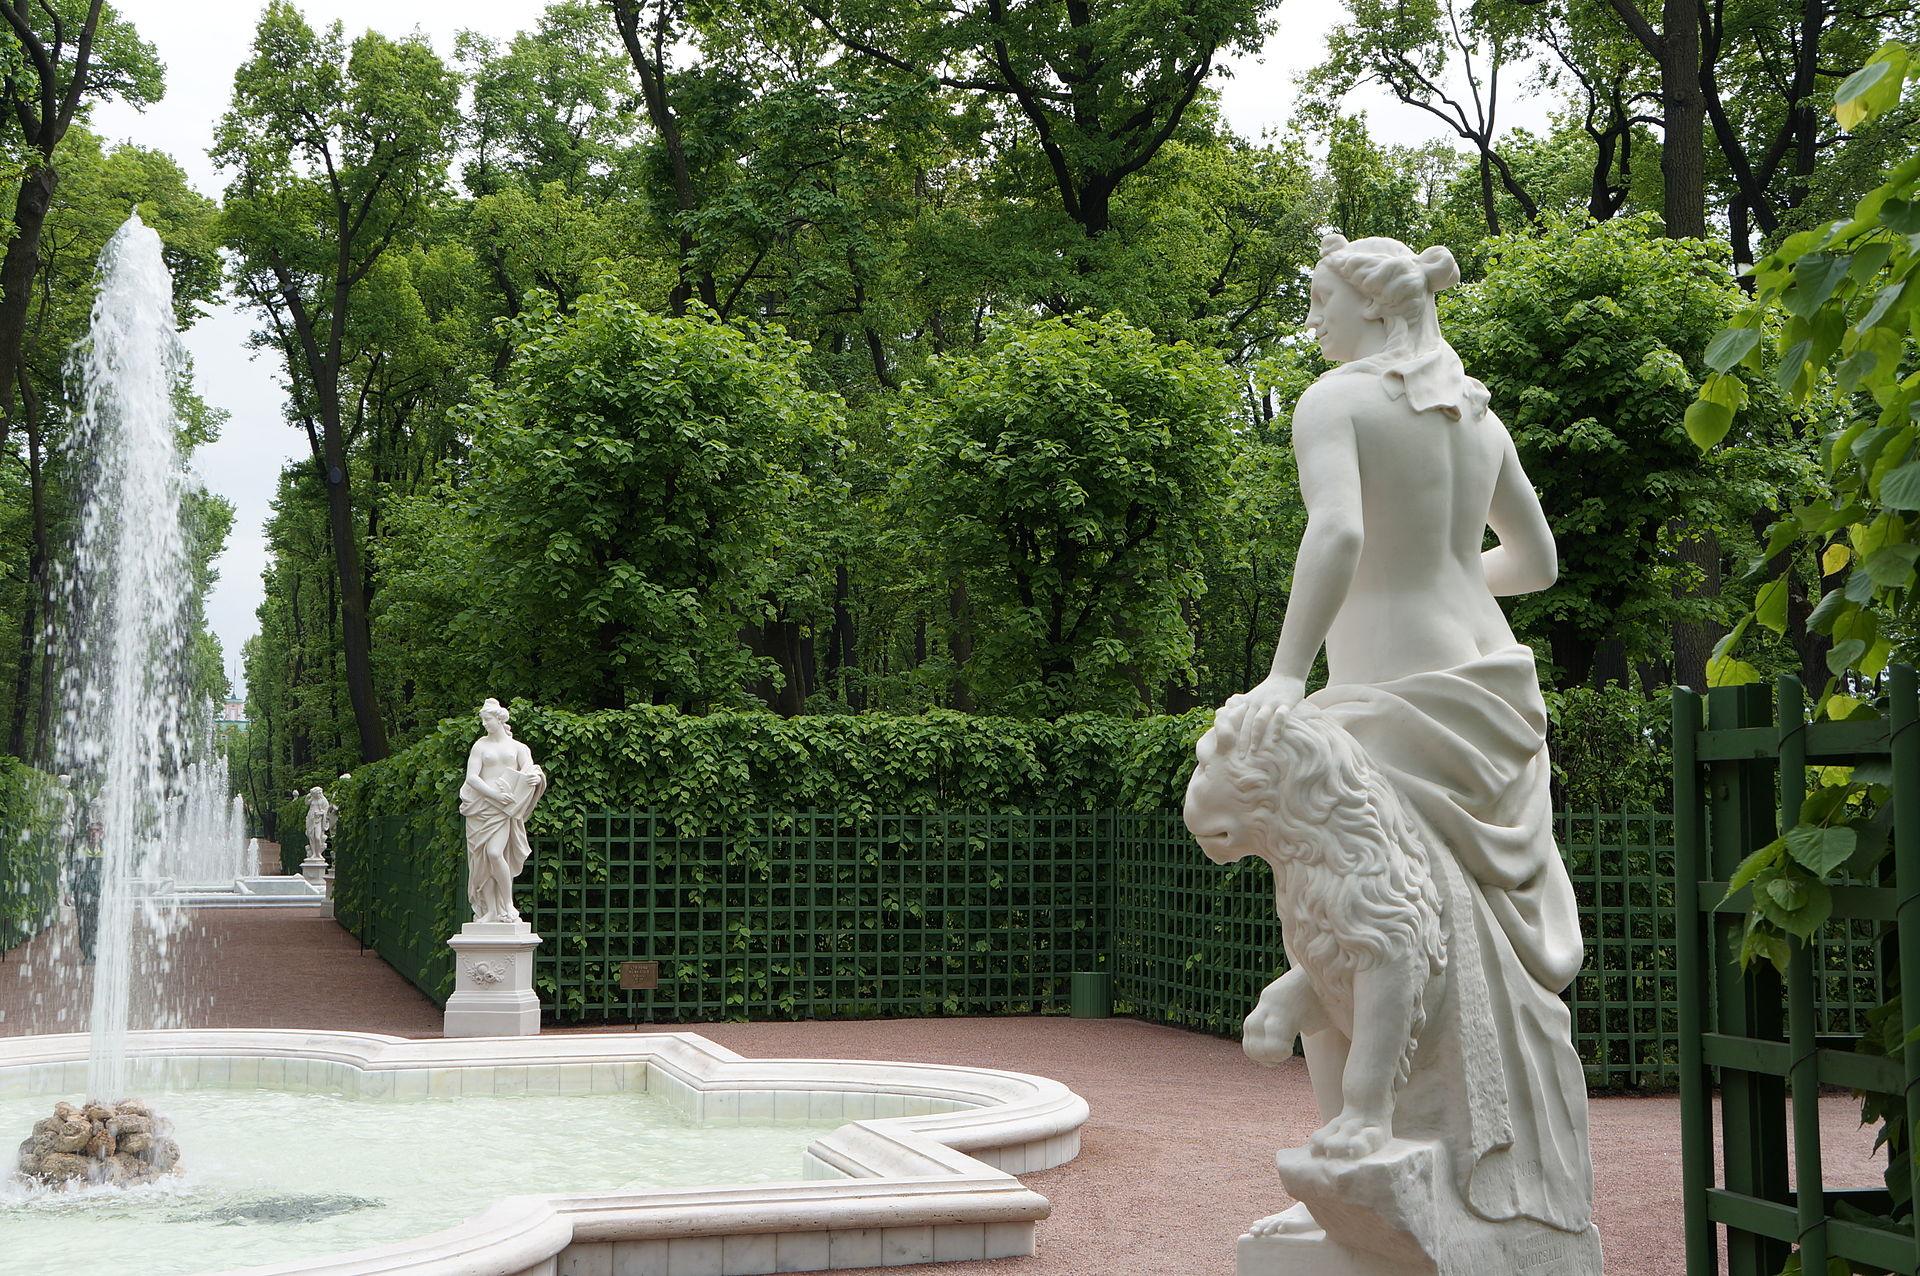 Летний сад. Центральная аллея. Шпалеры. Фонтан 2012 г. Автор фото: Евгений Со (Wikimedia Commons)